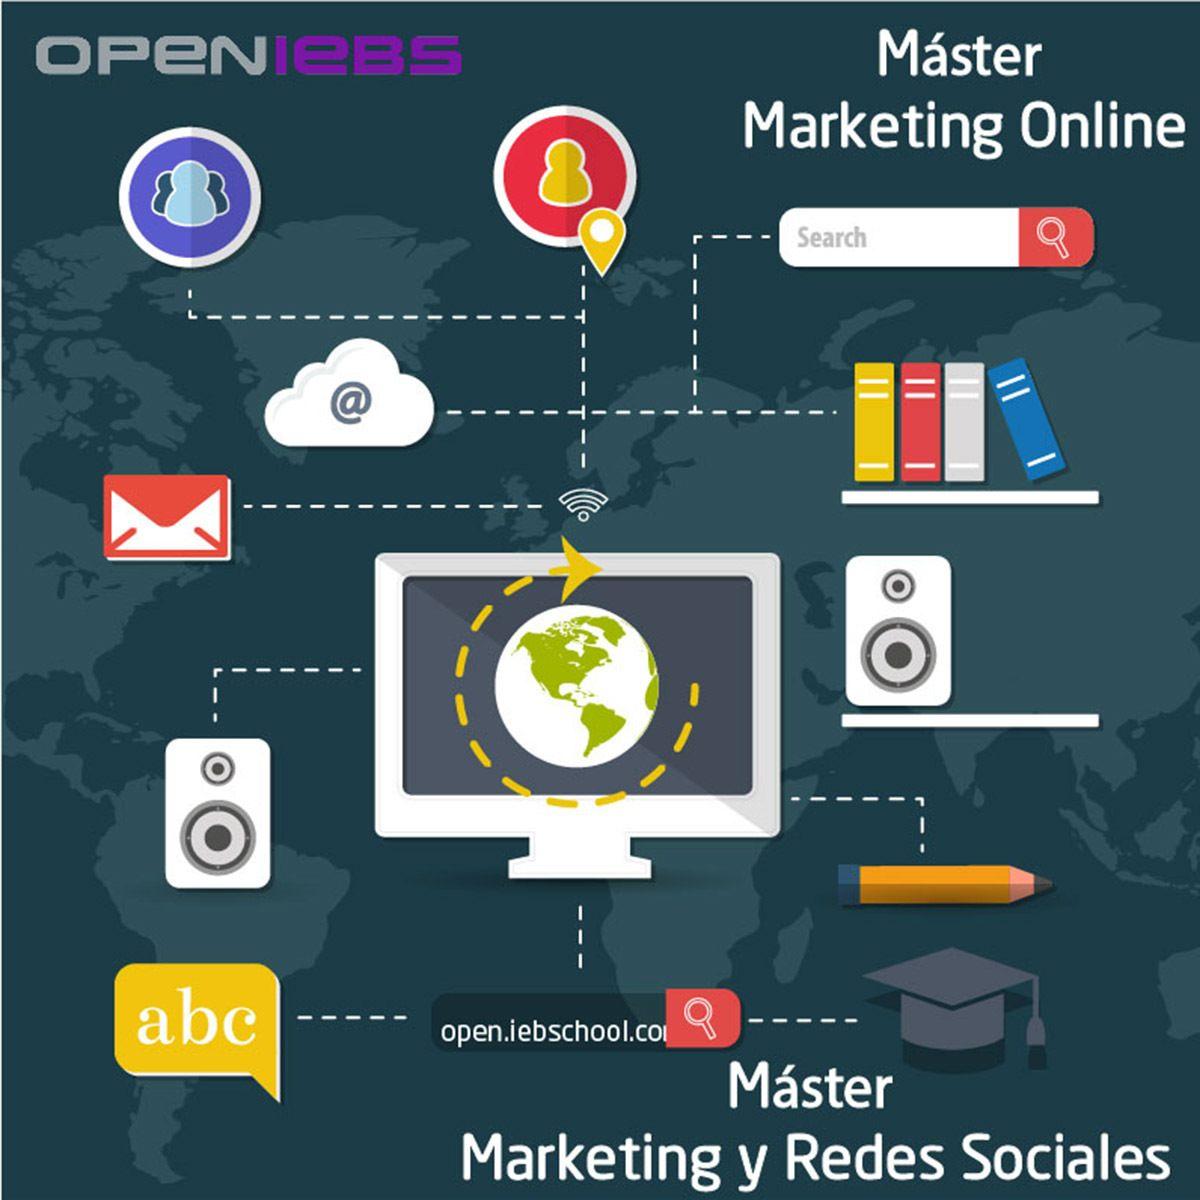 IEBS vuelve a revolucionar el sector educativo con Masters online Low Cost de alta gama - Open Post 21